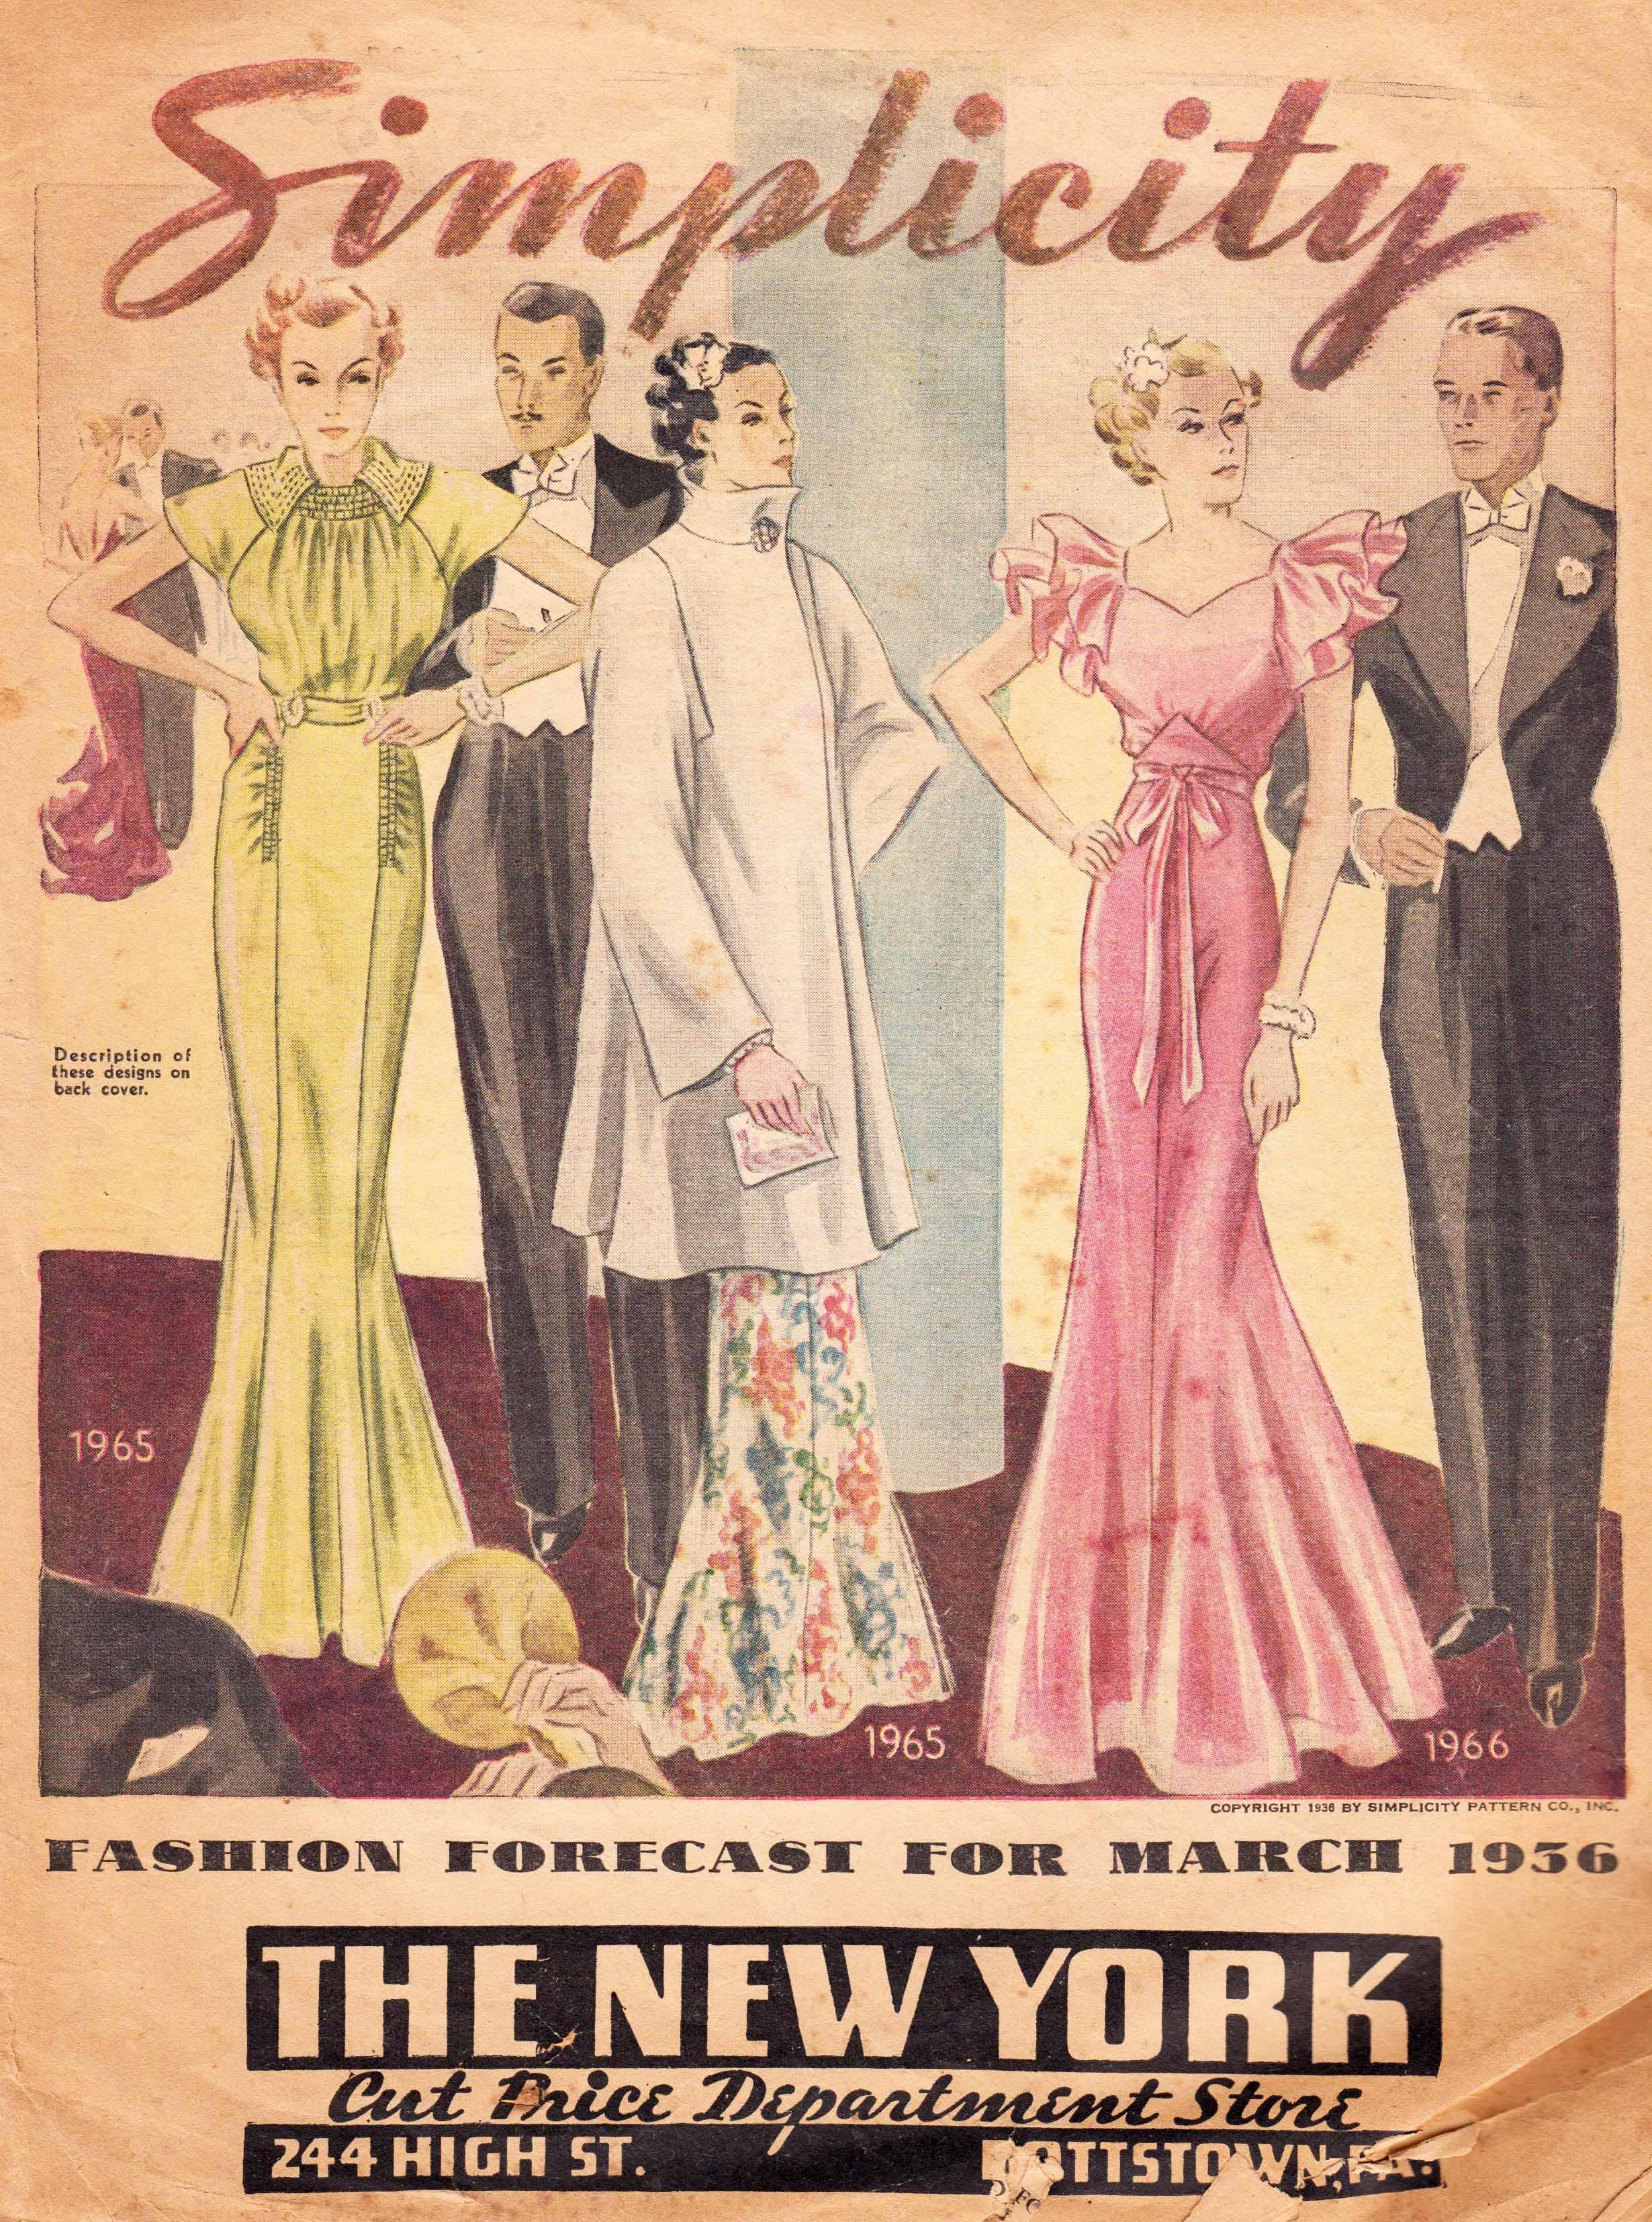 Simplicity Fashion Forecast March 1936